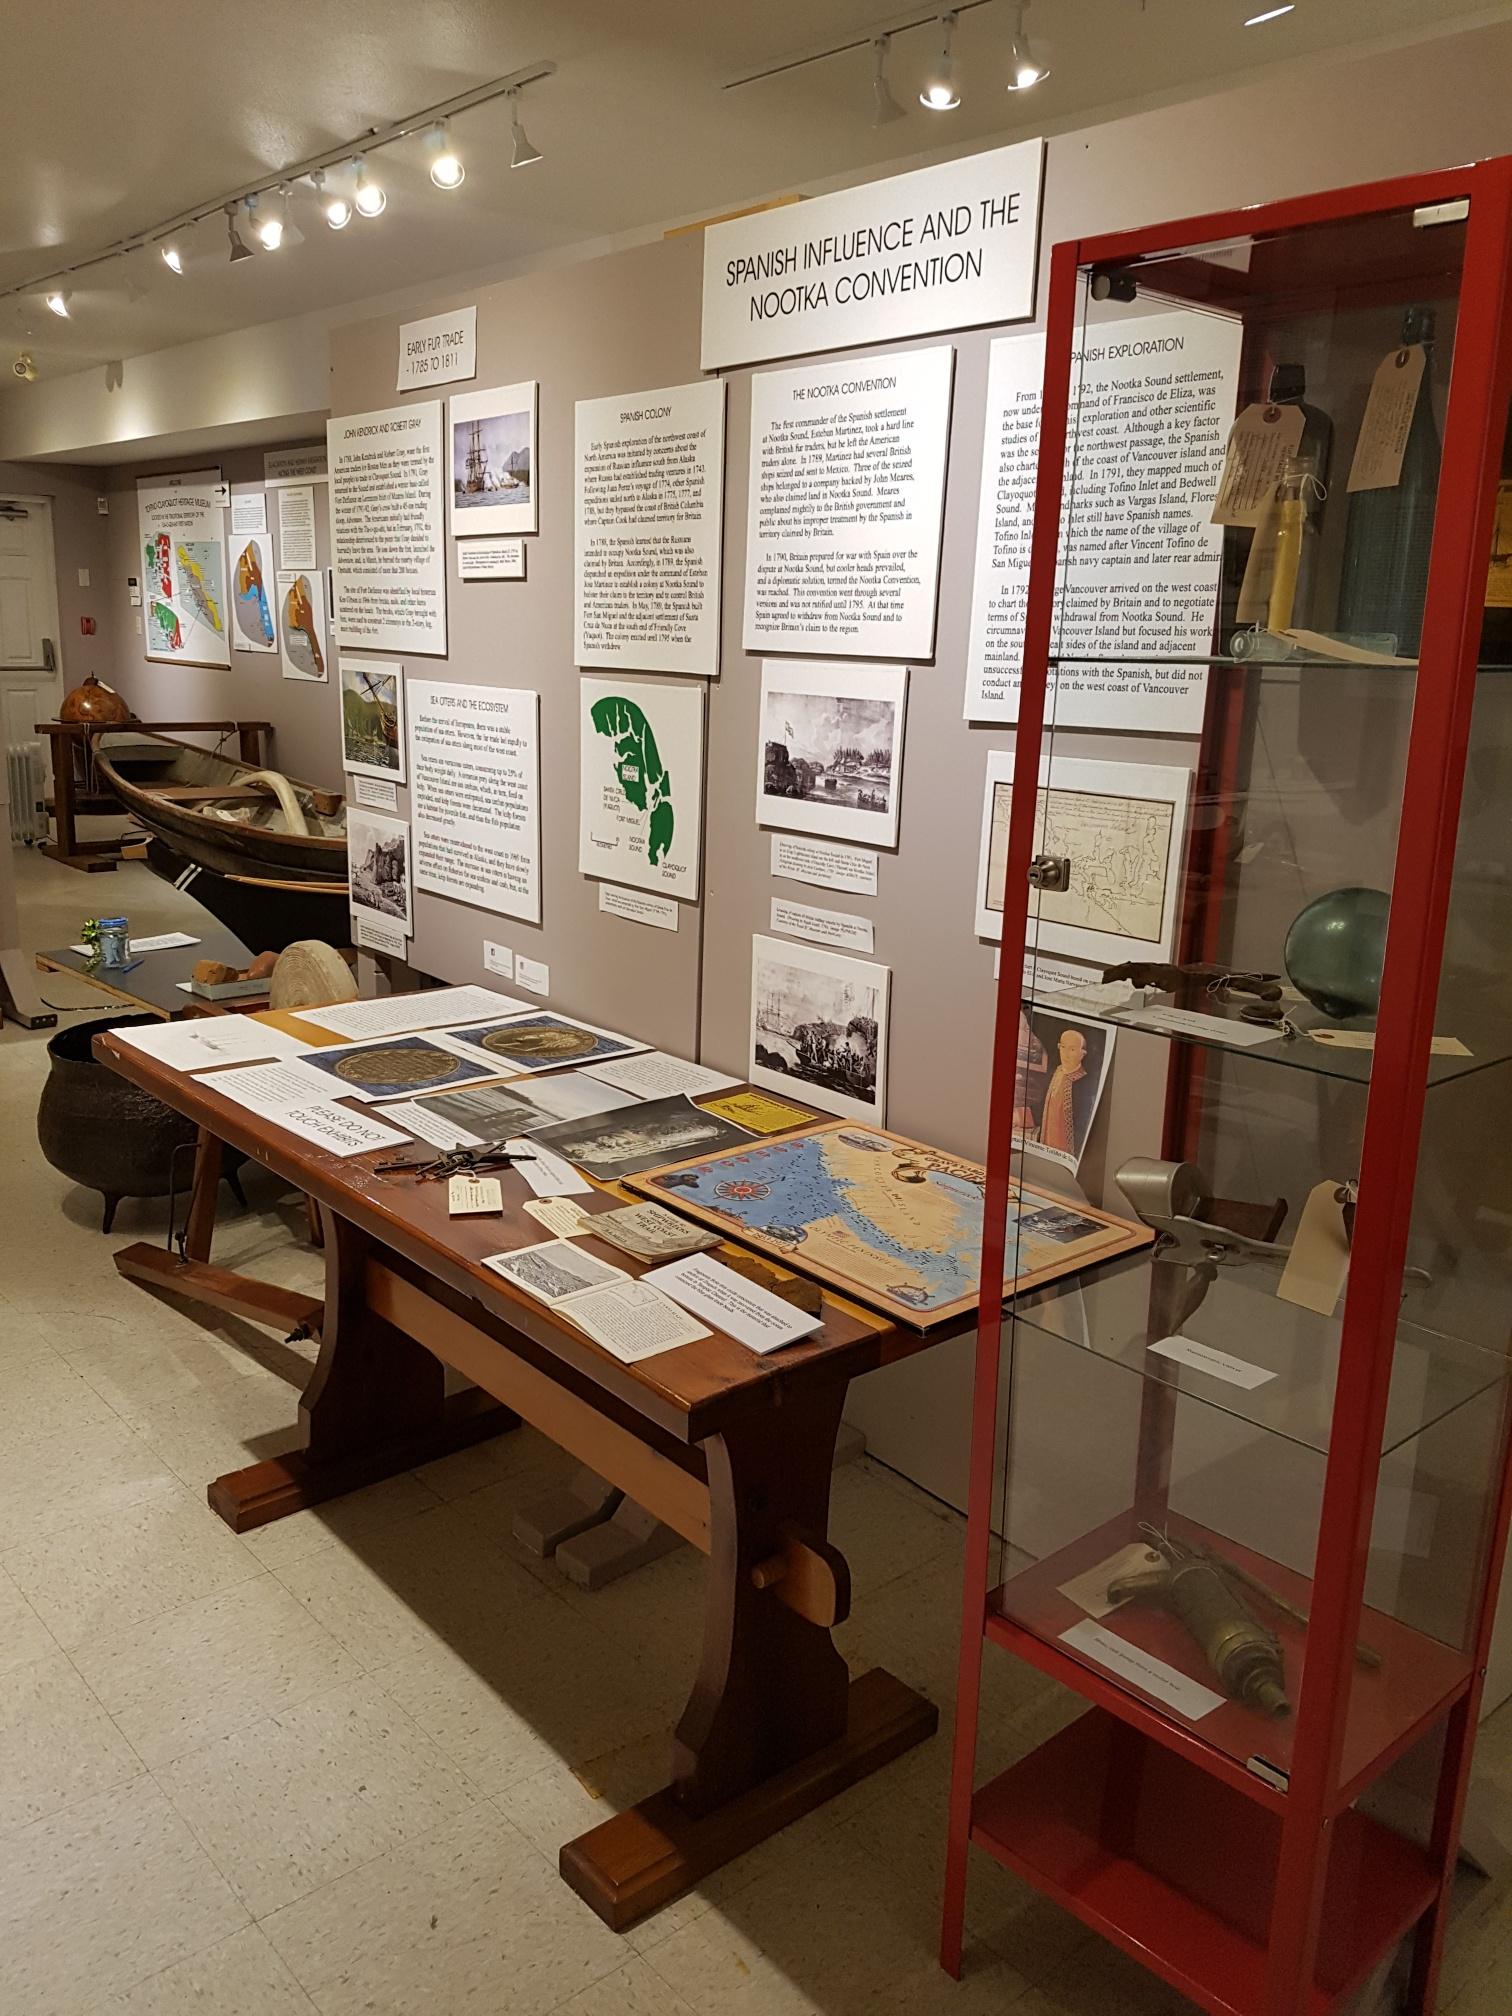 The Tofino-Clayoquot Heritage Society